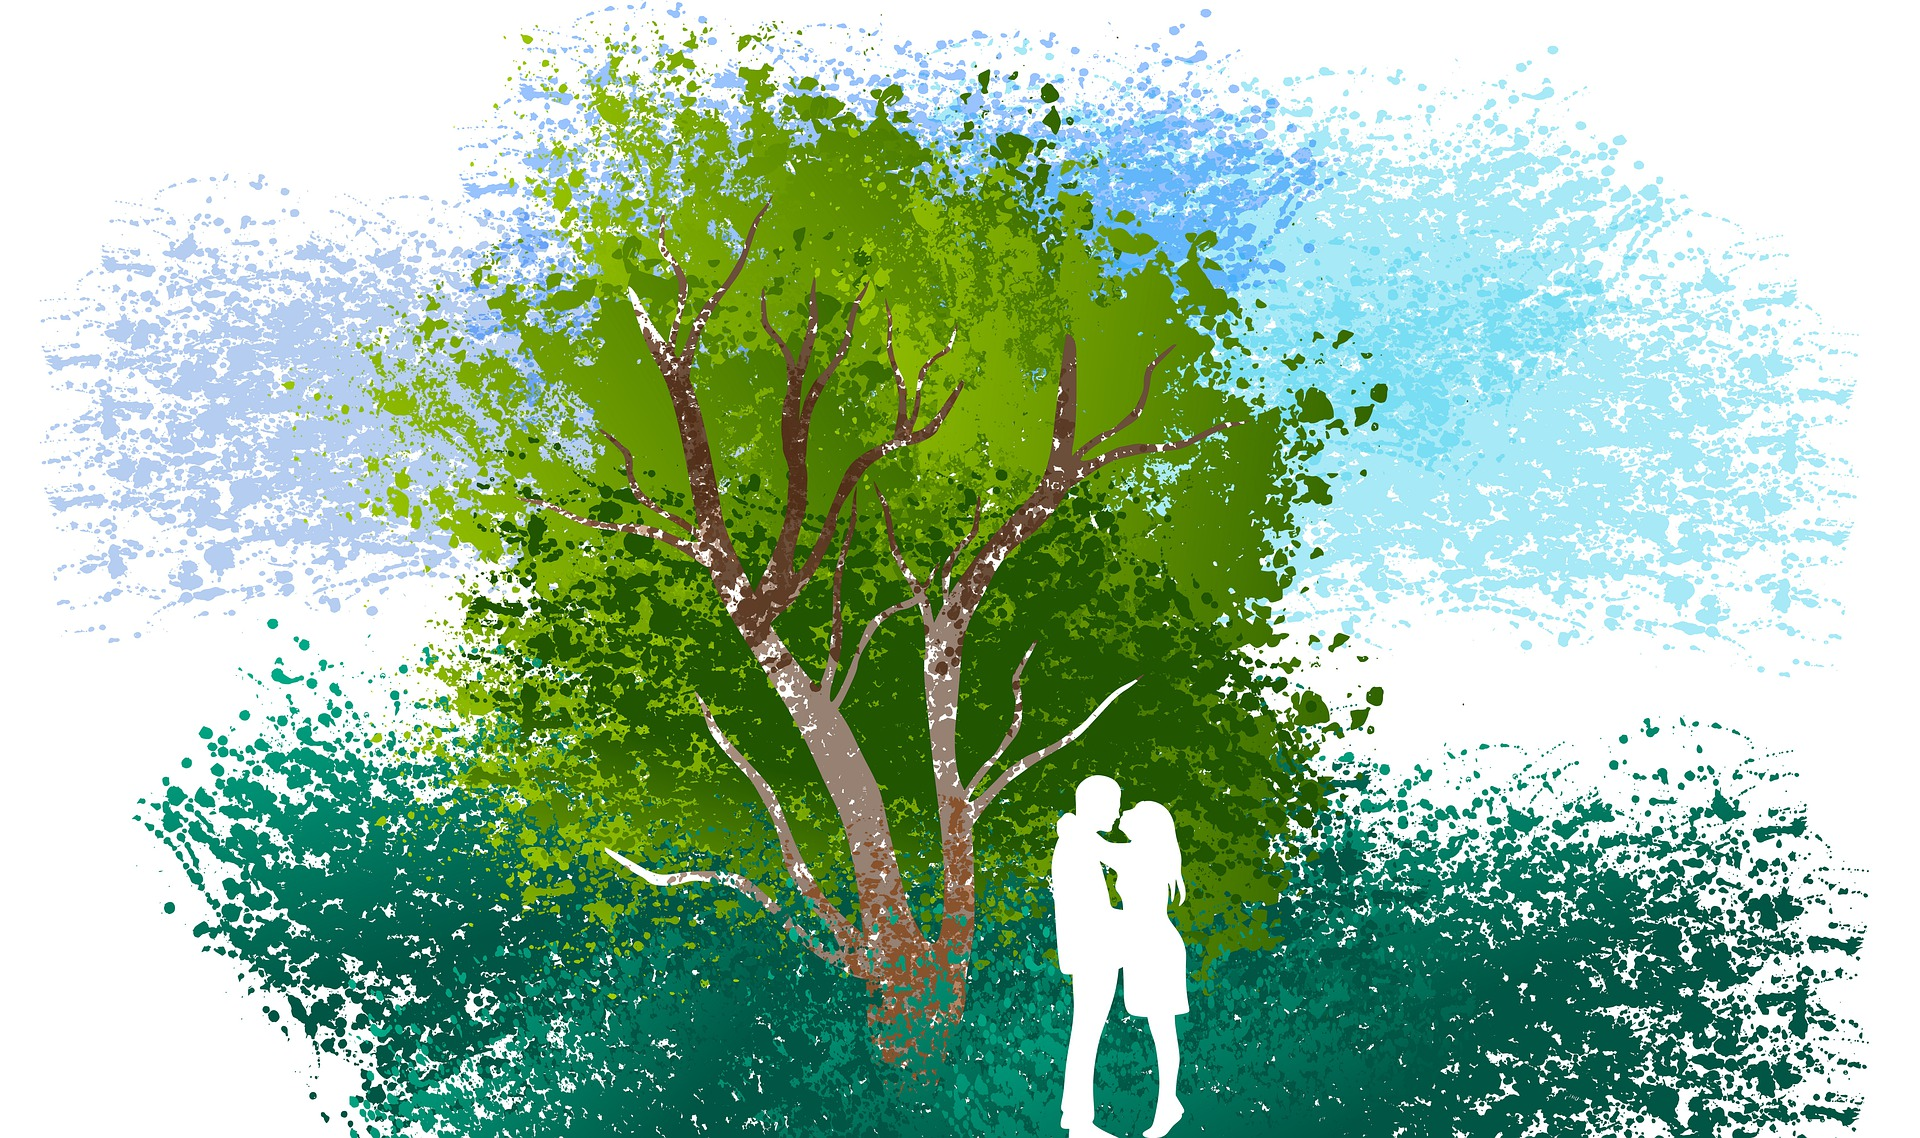 Žena a muž u stromu